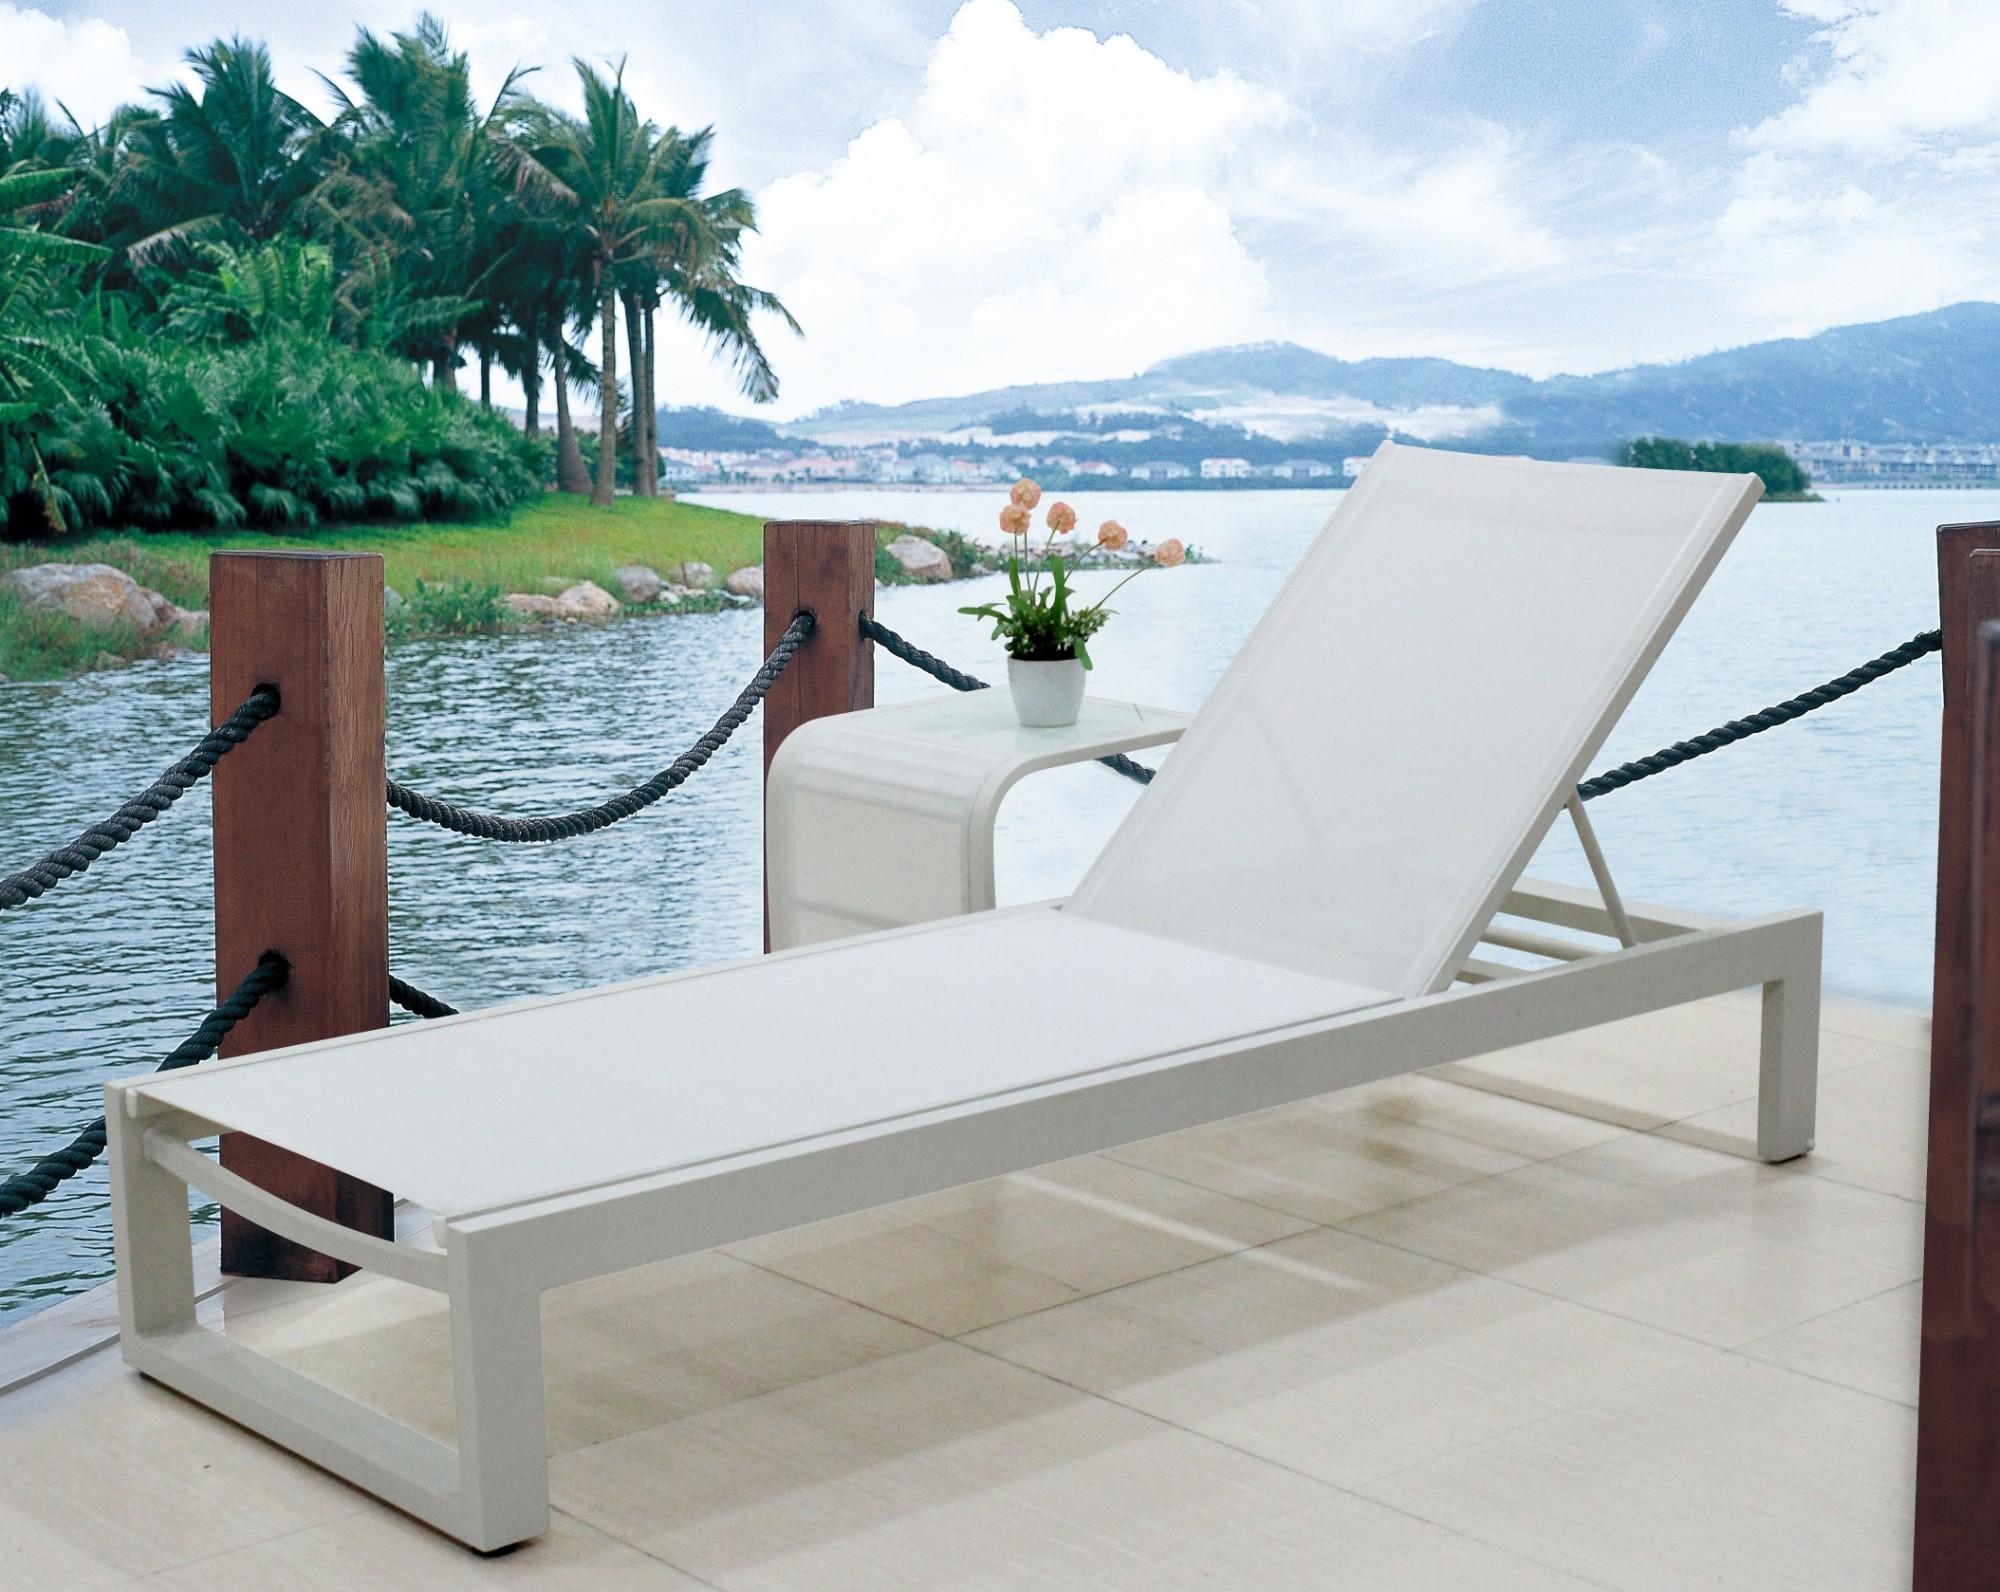 Aluminum Chaise Lounge Chair Outdoor Sofa Manufacturers, Aluminum Chaise Lounge Chair Outdoor Sofa Factory, Supply Aluminum Chaise Lounge Chair Outdoor Sofa